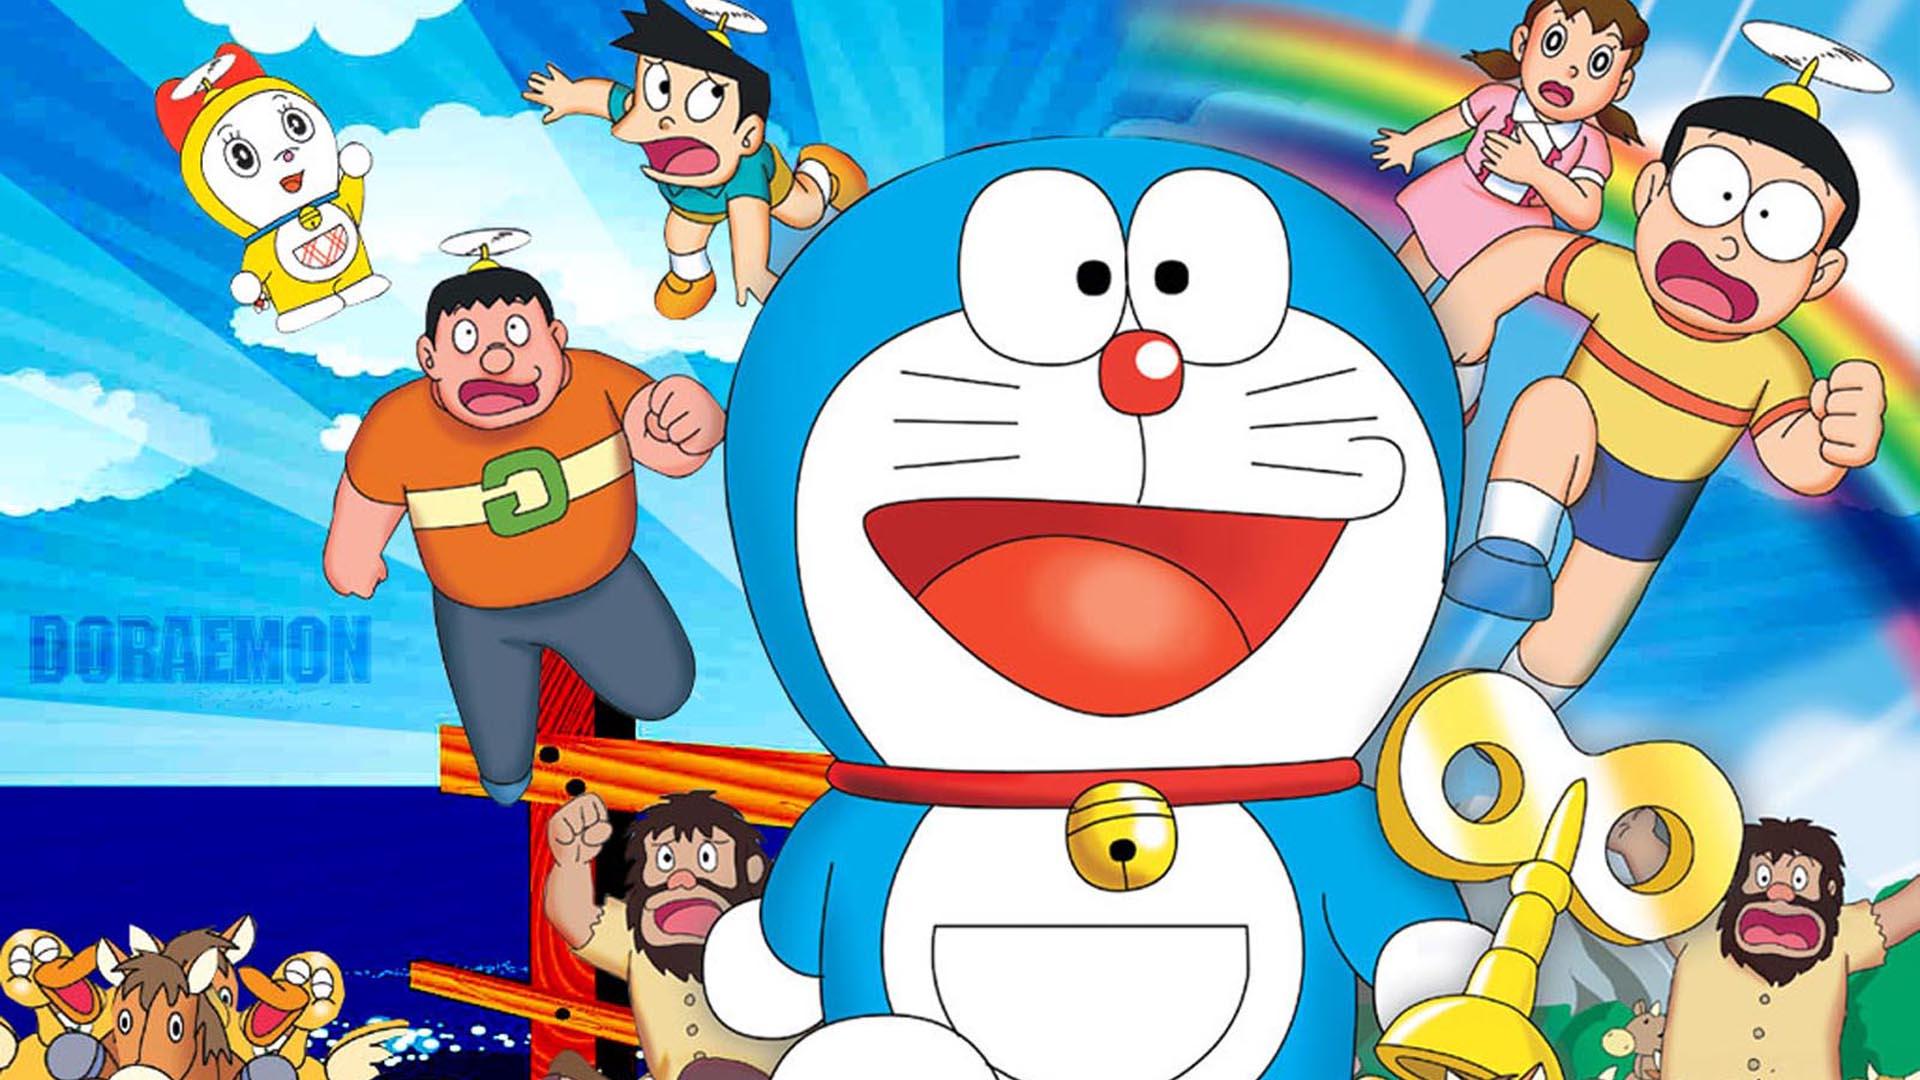 Top 30 addicting anime Top 30 Doraemon visual haruhichan.com series